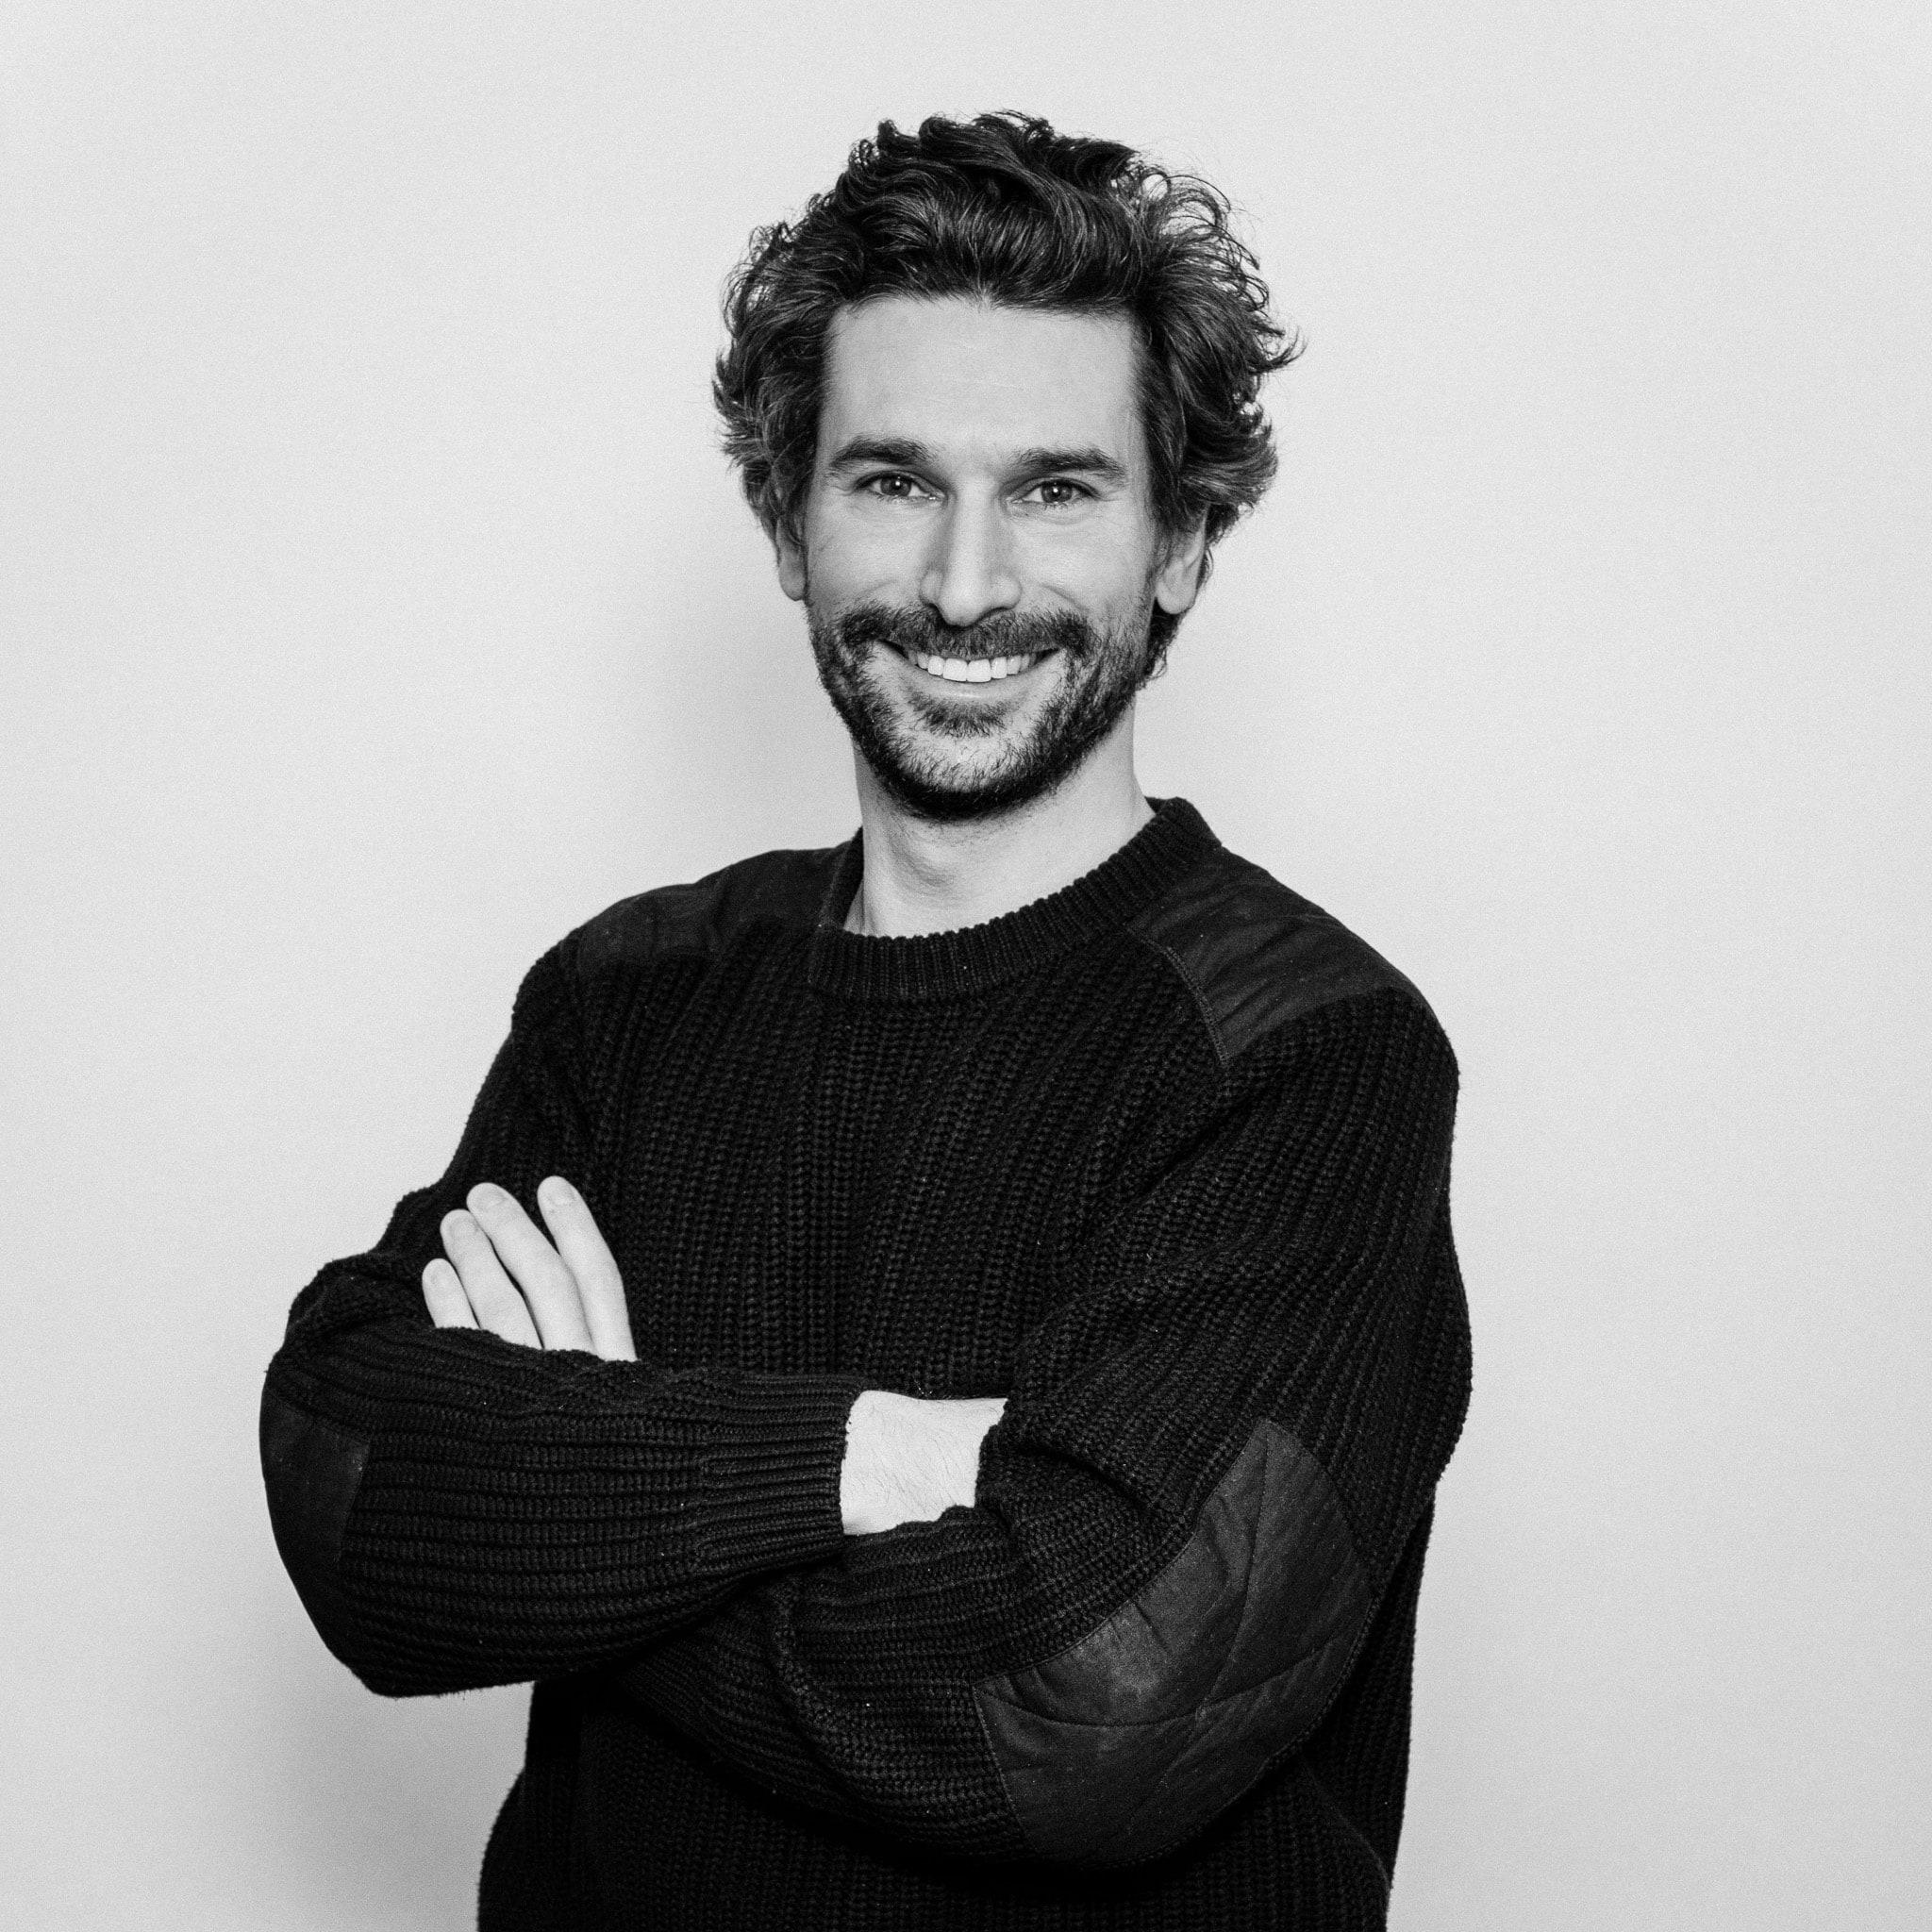 Romain HIRSCHMANN